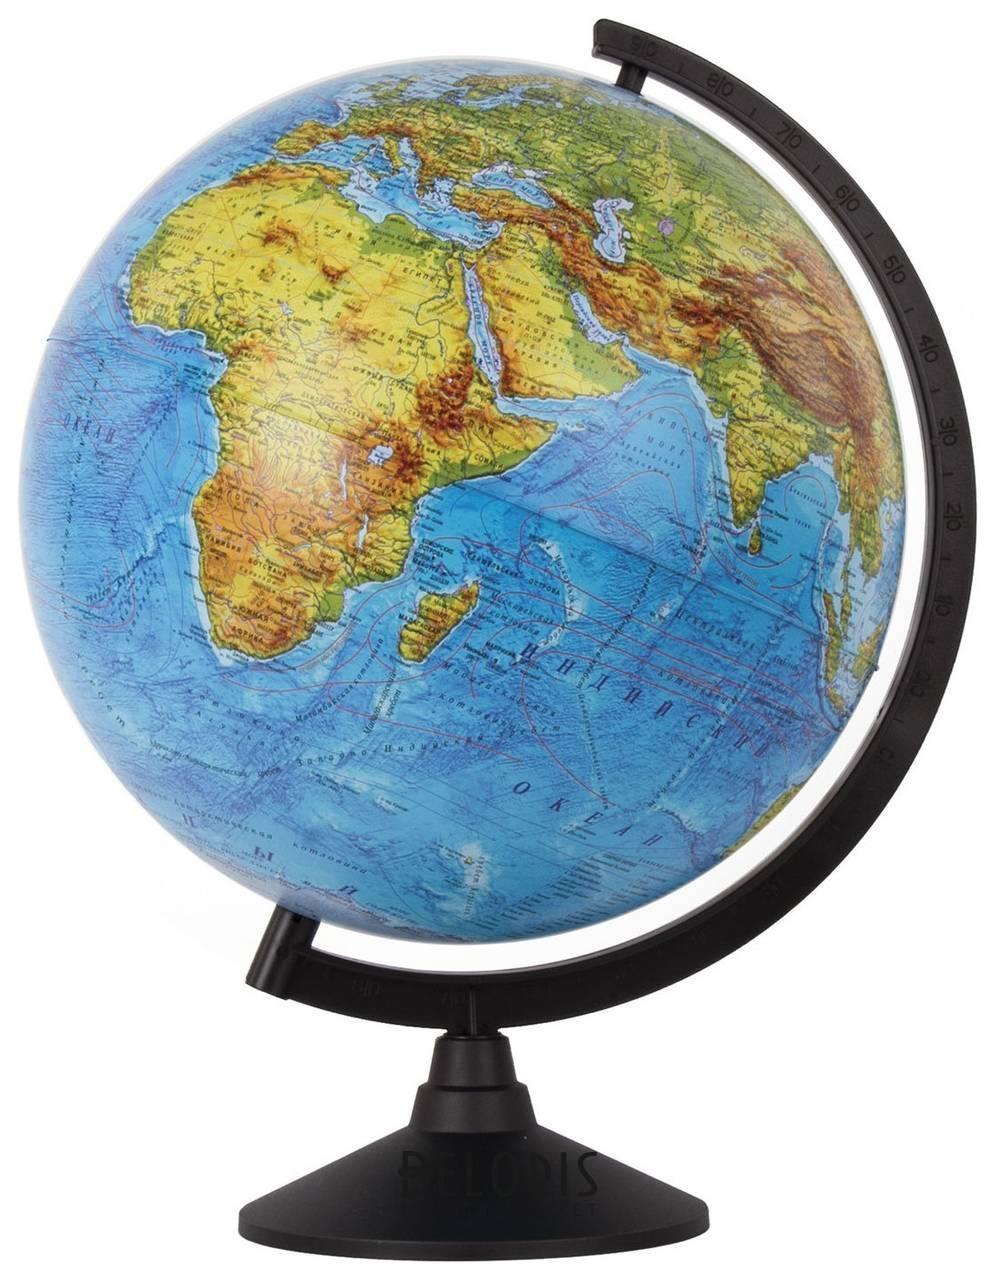 Глобус физический, диаметр 320 мм, масштаб 1:40 000 000 Классик Globen